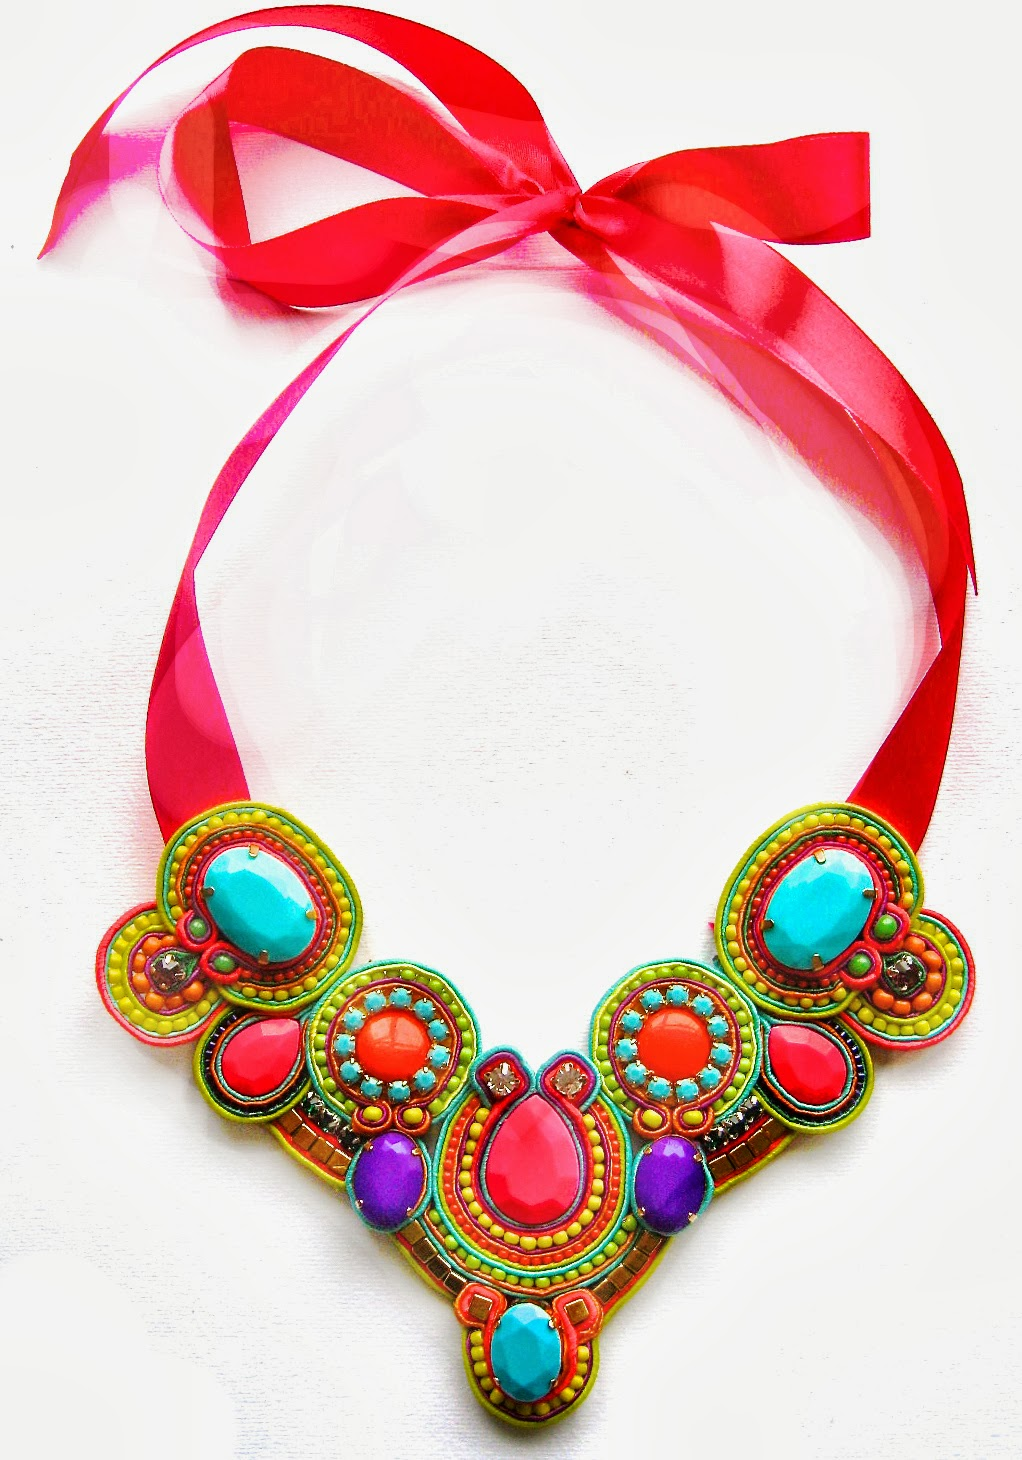 Shop Hunting Divas: Black Market Jewels - No Need for Words